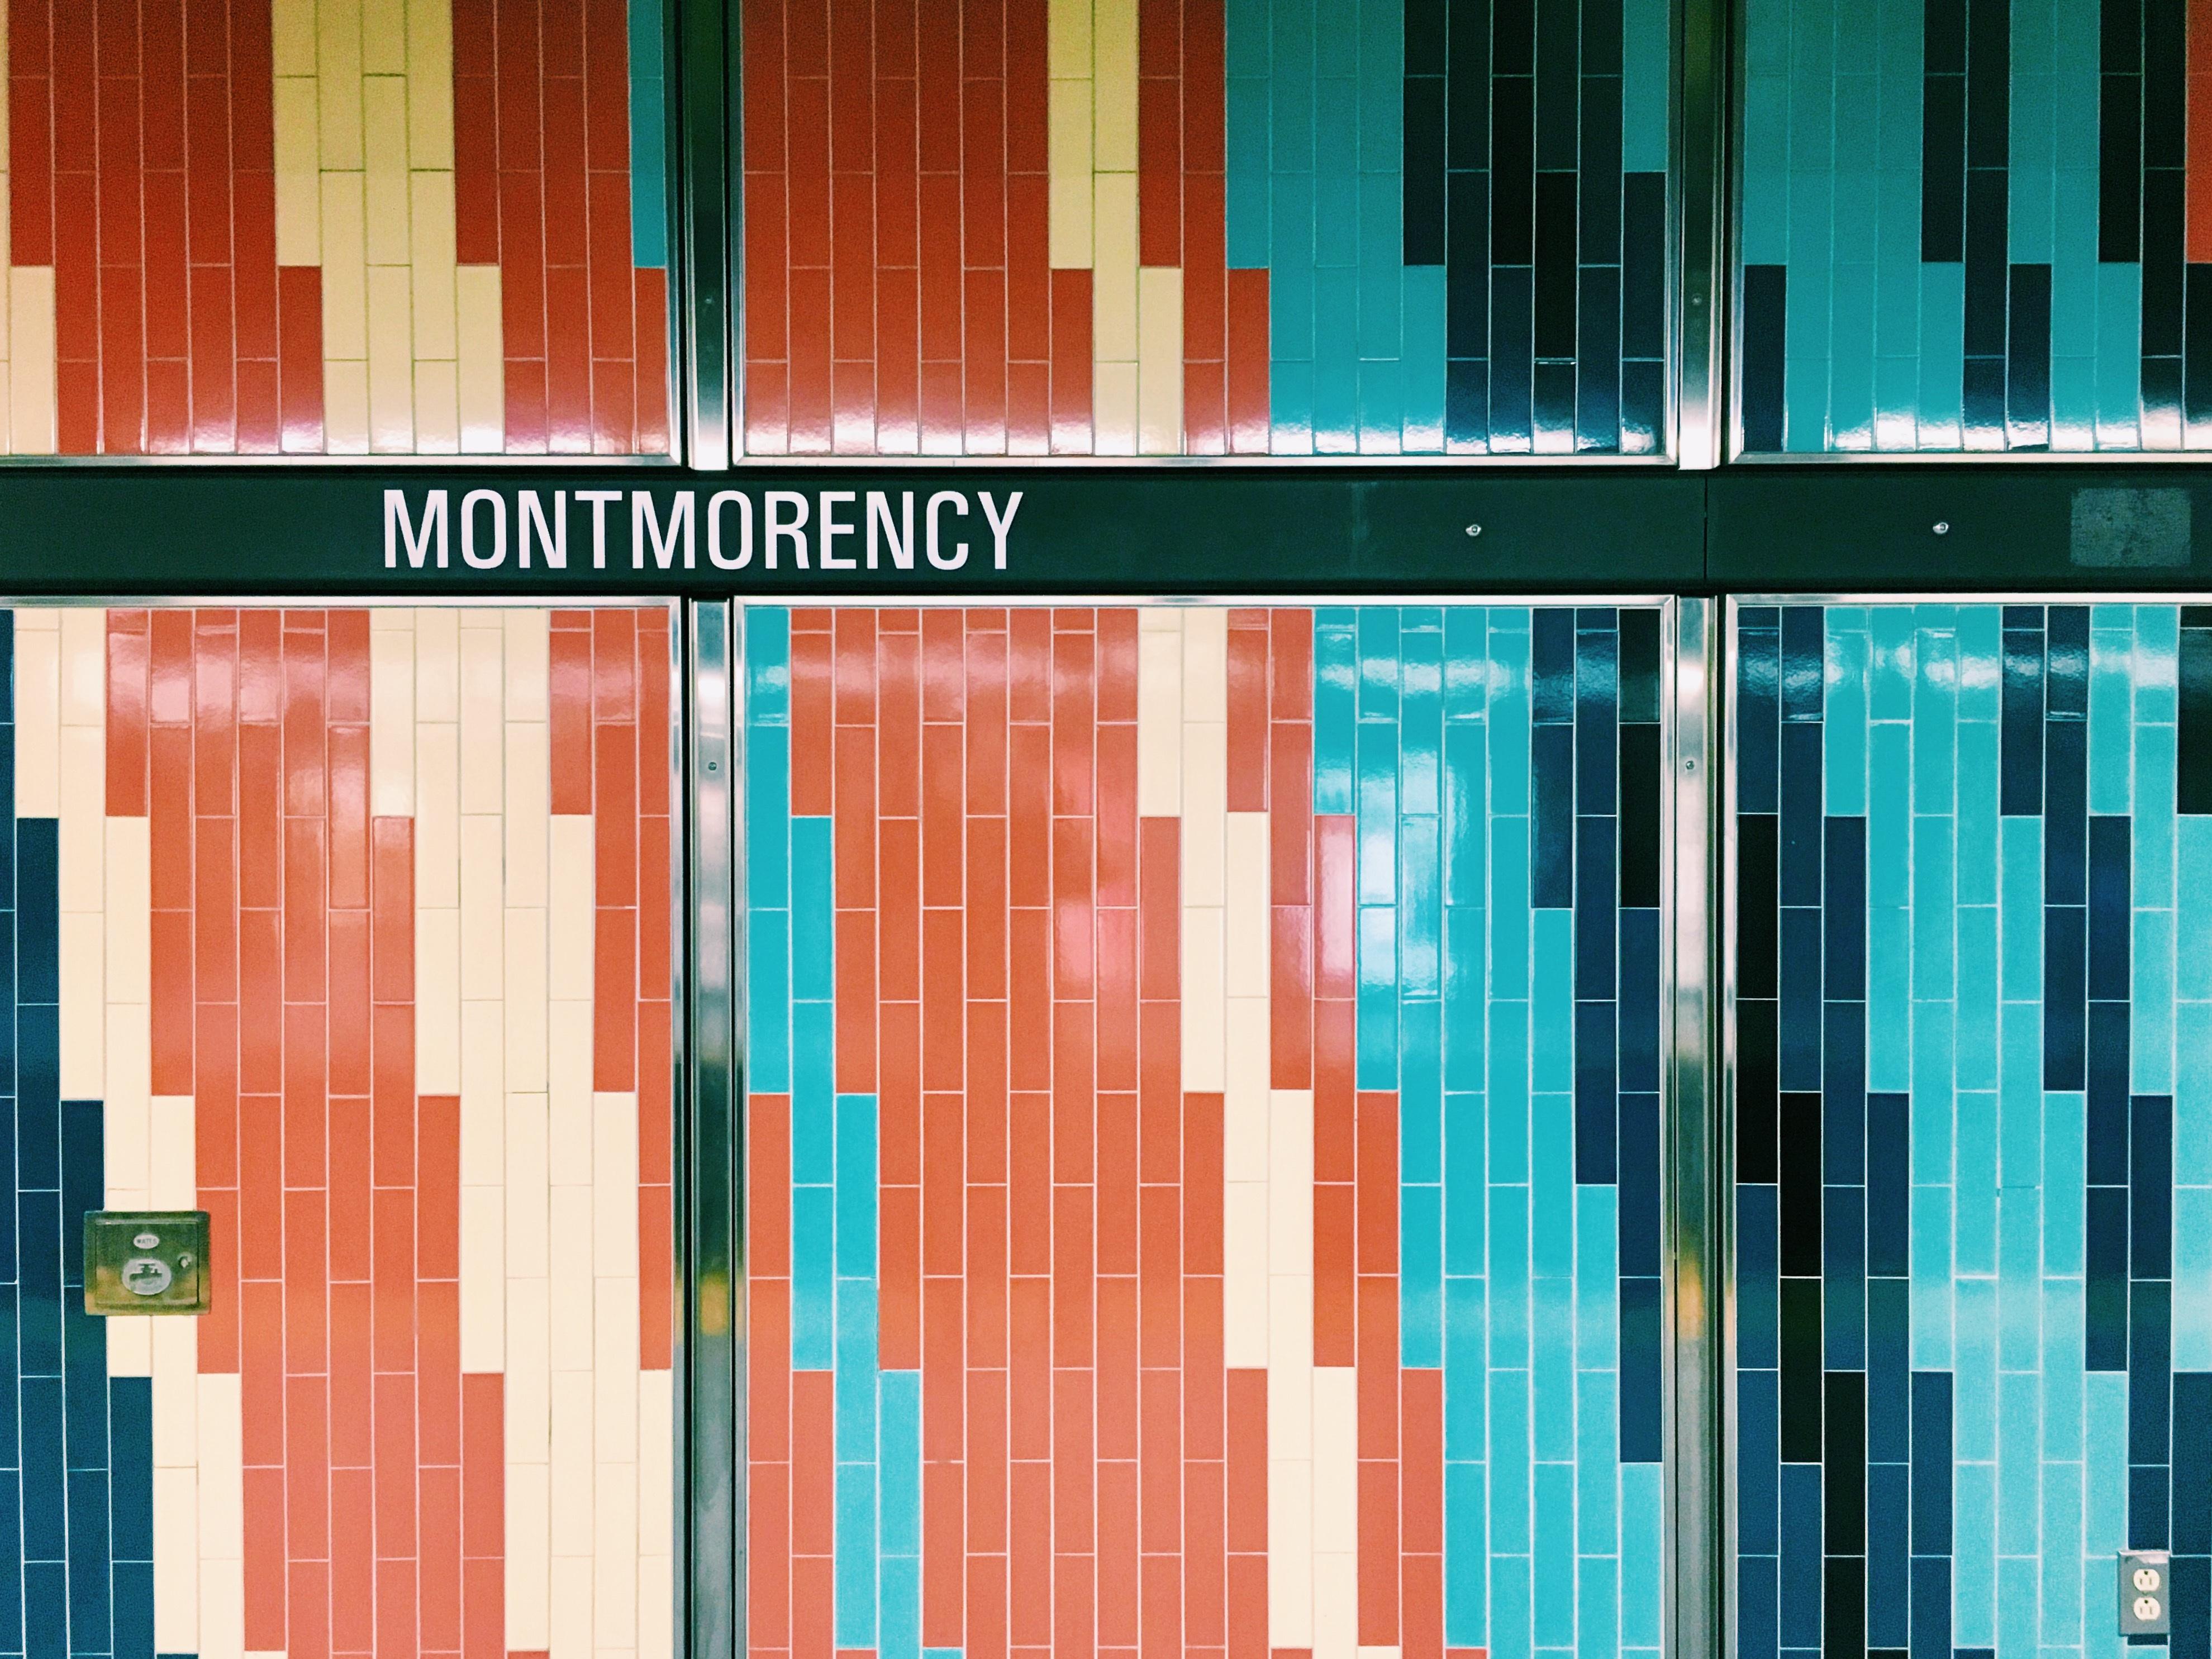 Kostenlose foto : Glas, Mauer, Muster, Linie, Farbe, Fassade ...